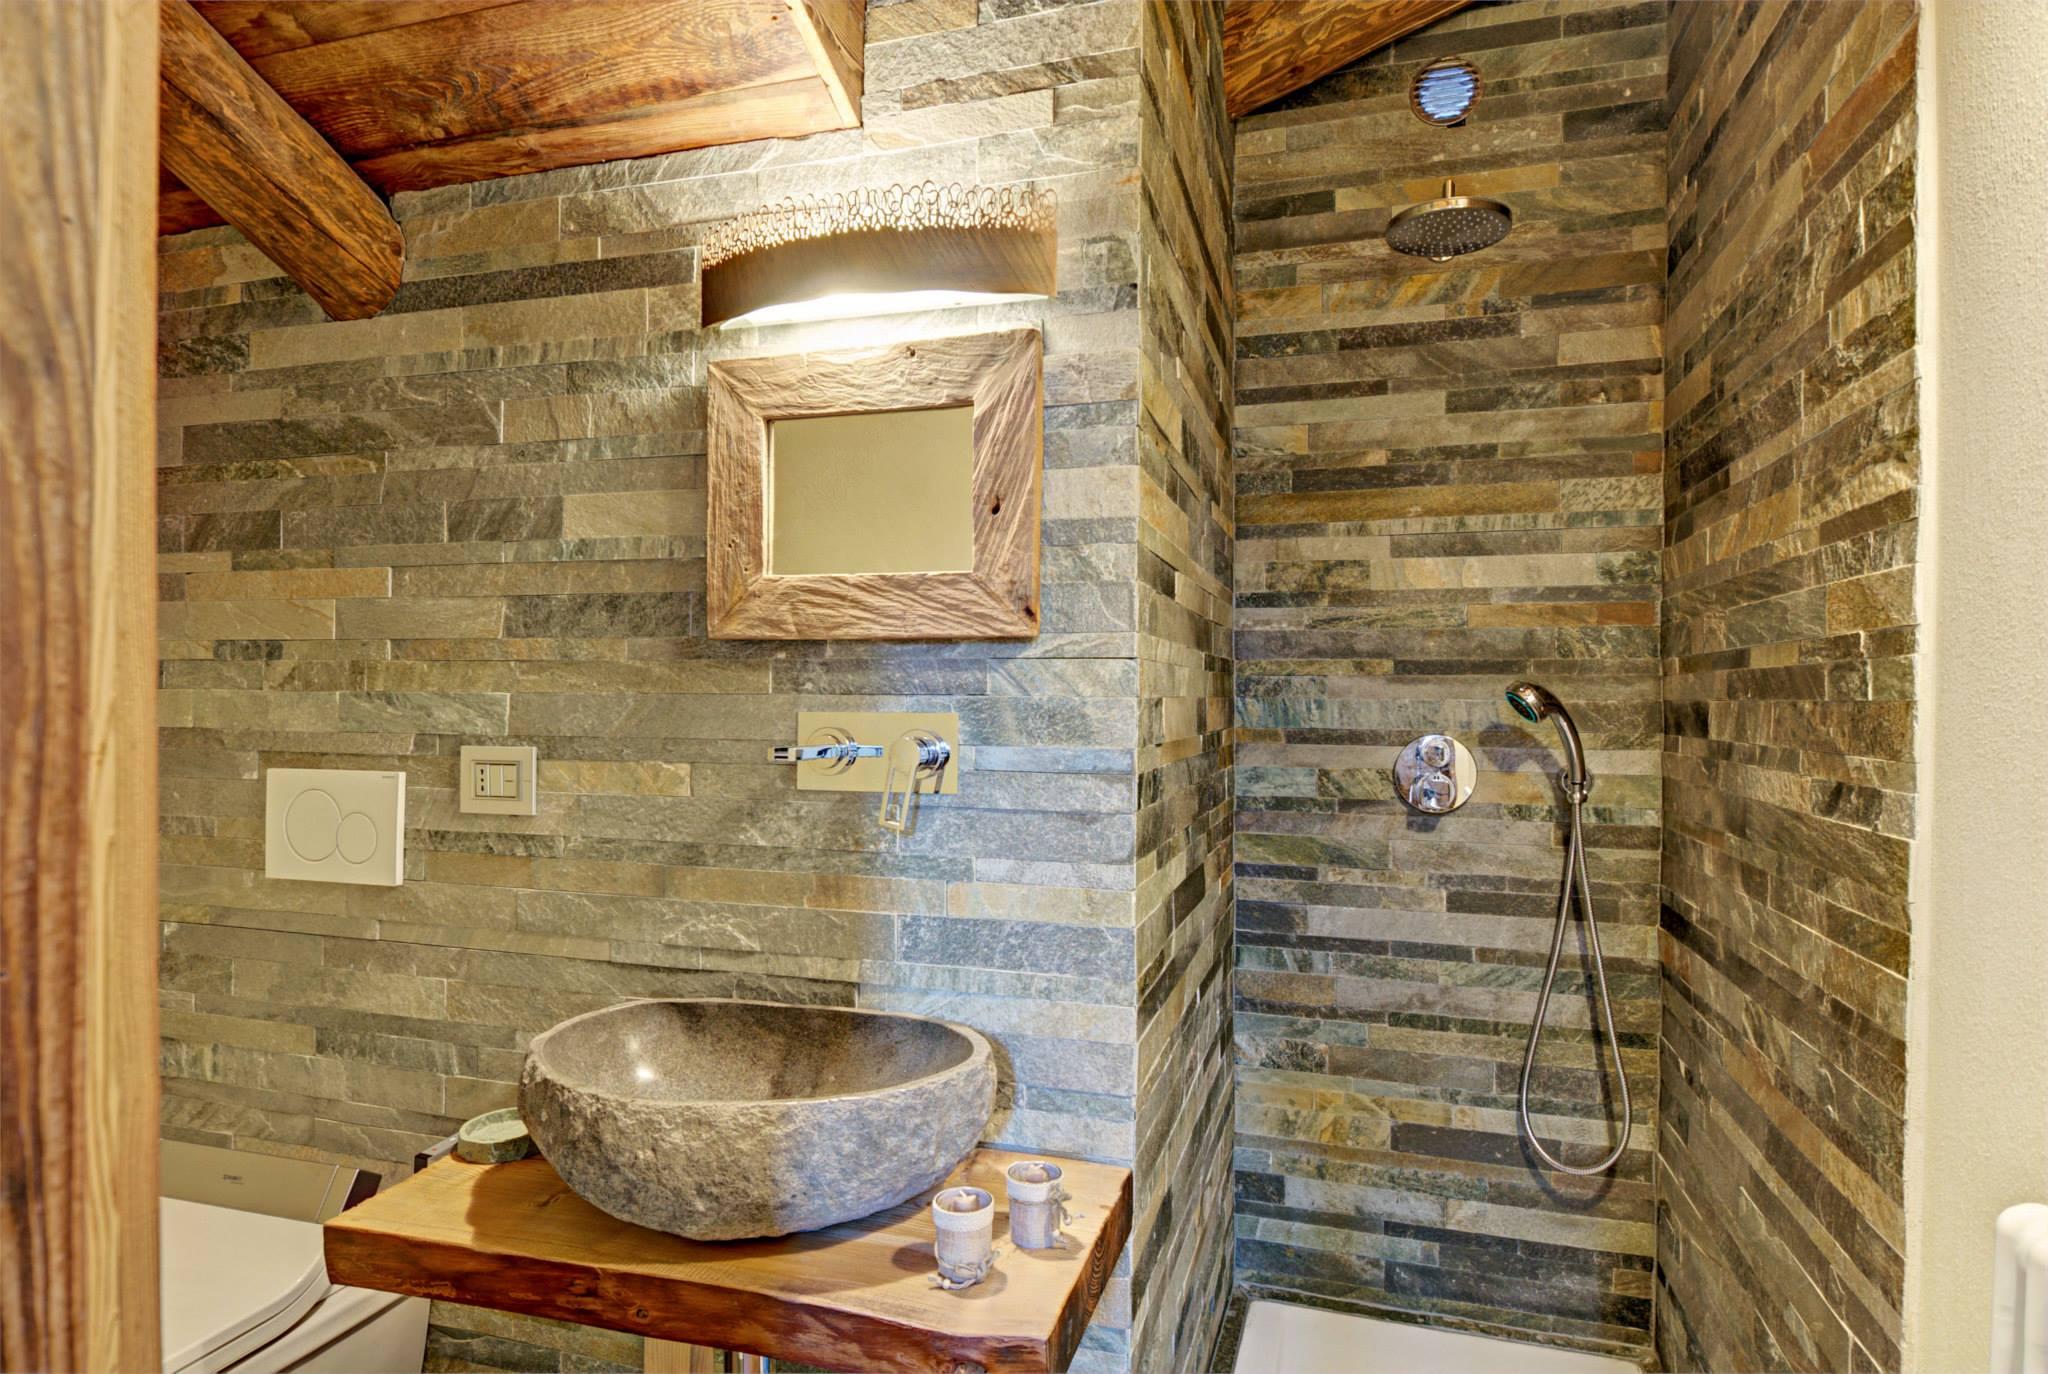 Baño De Tina Natural:Lavatorio del cuarto de baño de piedra reposa sobre una mesa de